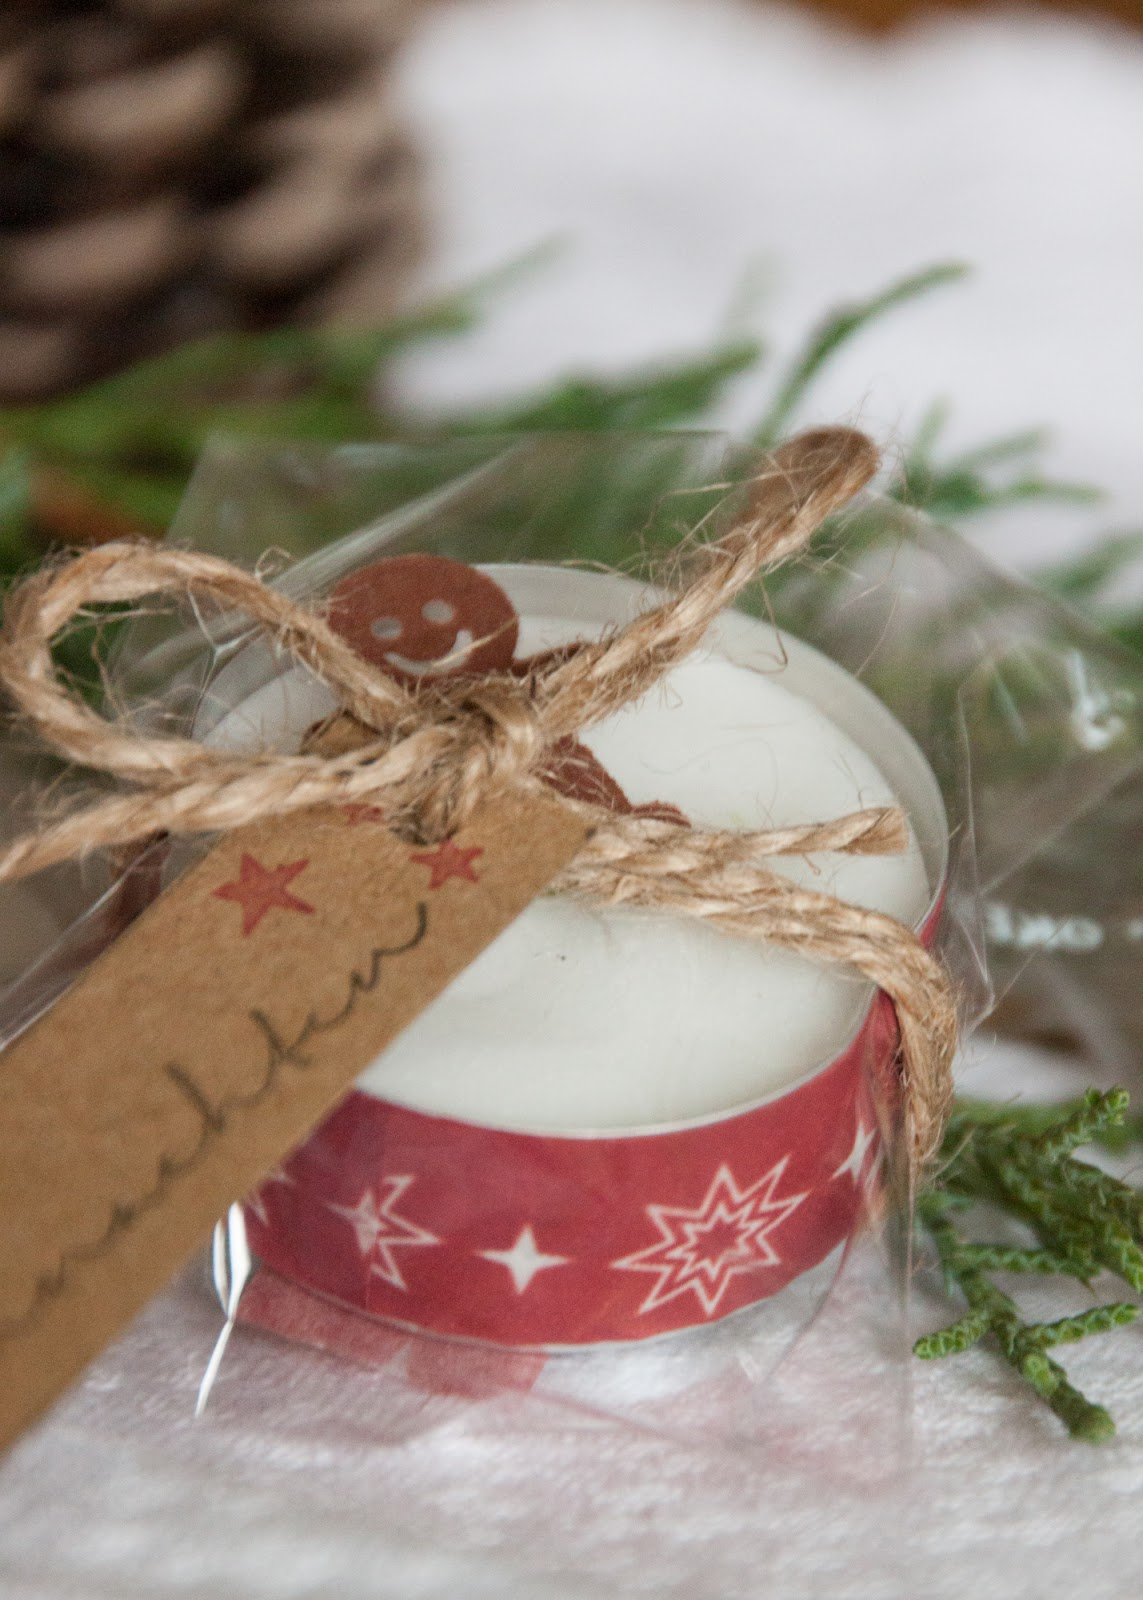 trollenland last minute weihnachts geschenke. Black Bedroom Furniture Sets. Home Design Ideas